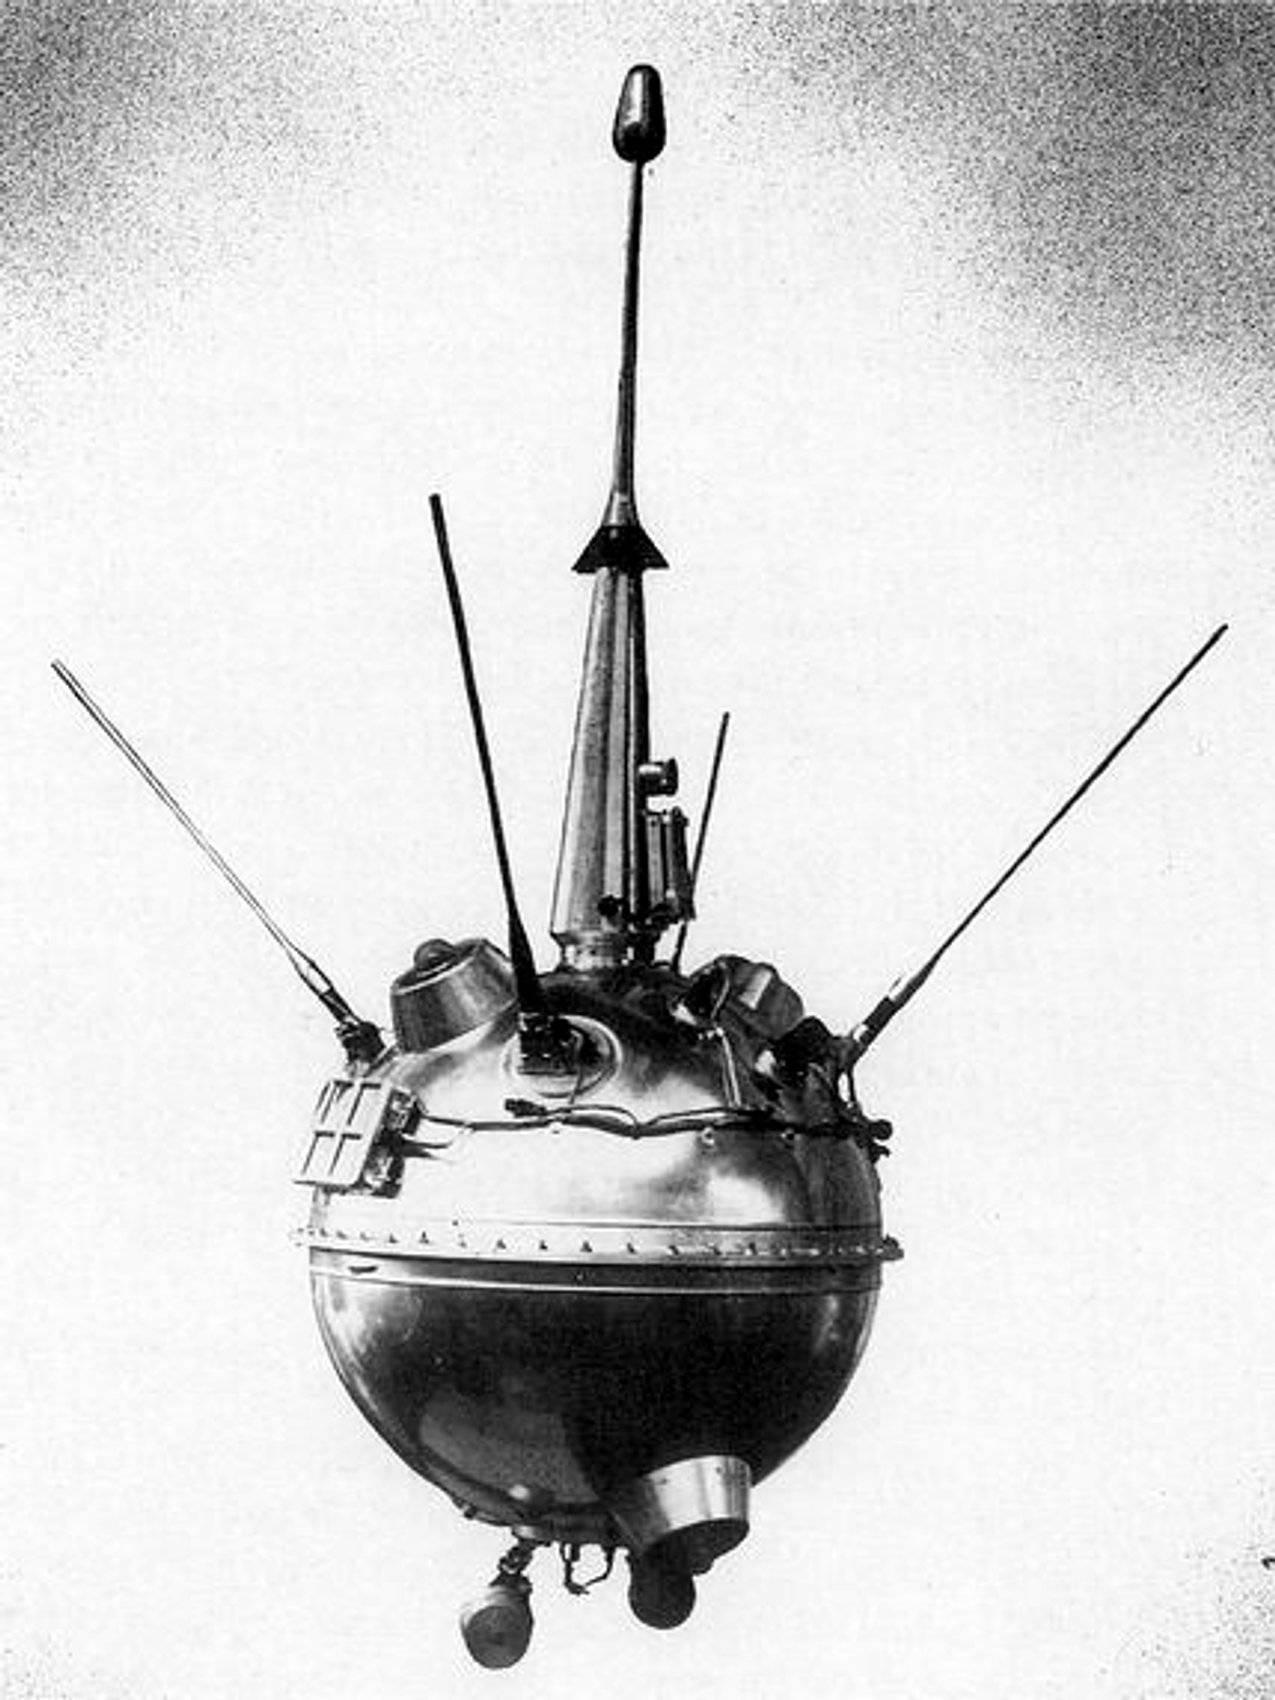 La sonda espacial Luna 2. / NASA